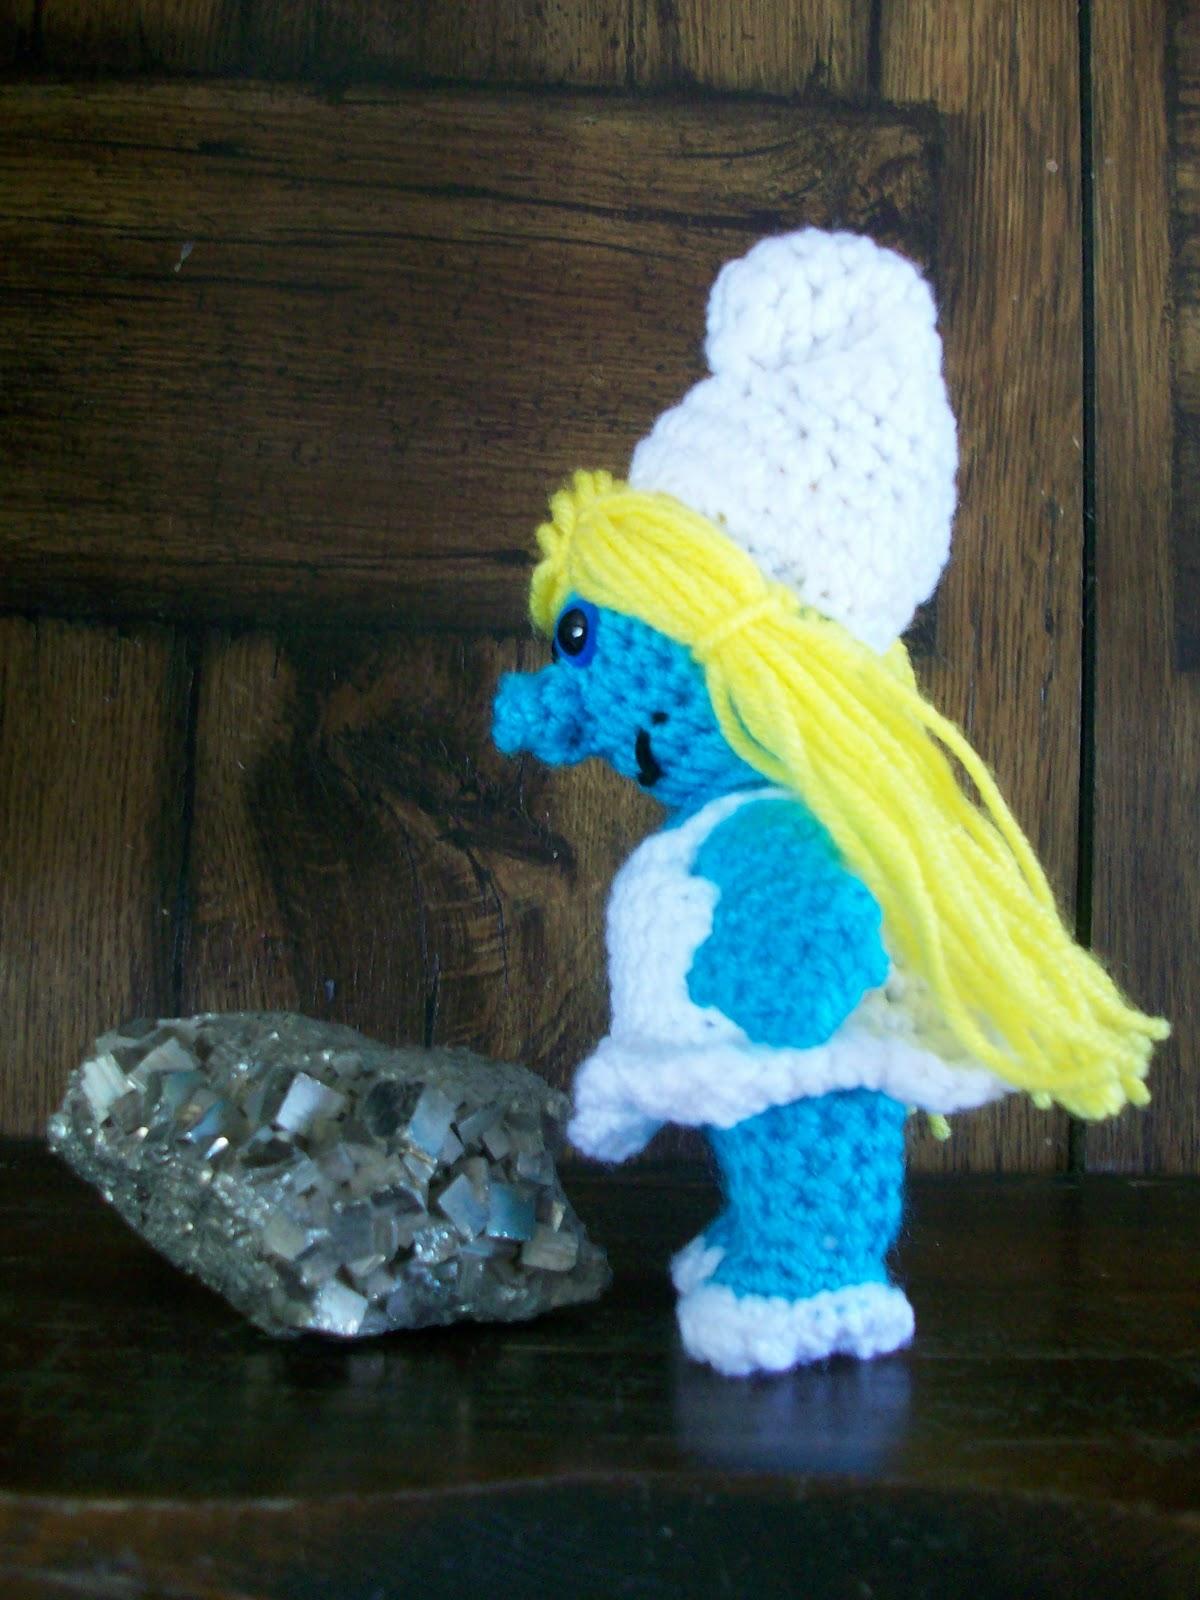 My crocheted world smurfette free crochet pattern rnd 1 6 sc in mc 6 bankloansurffo Image collections